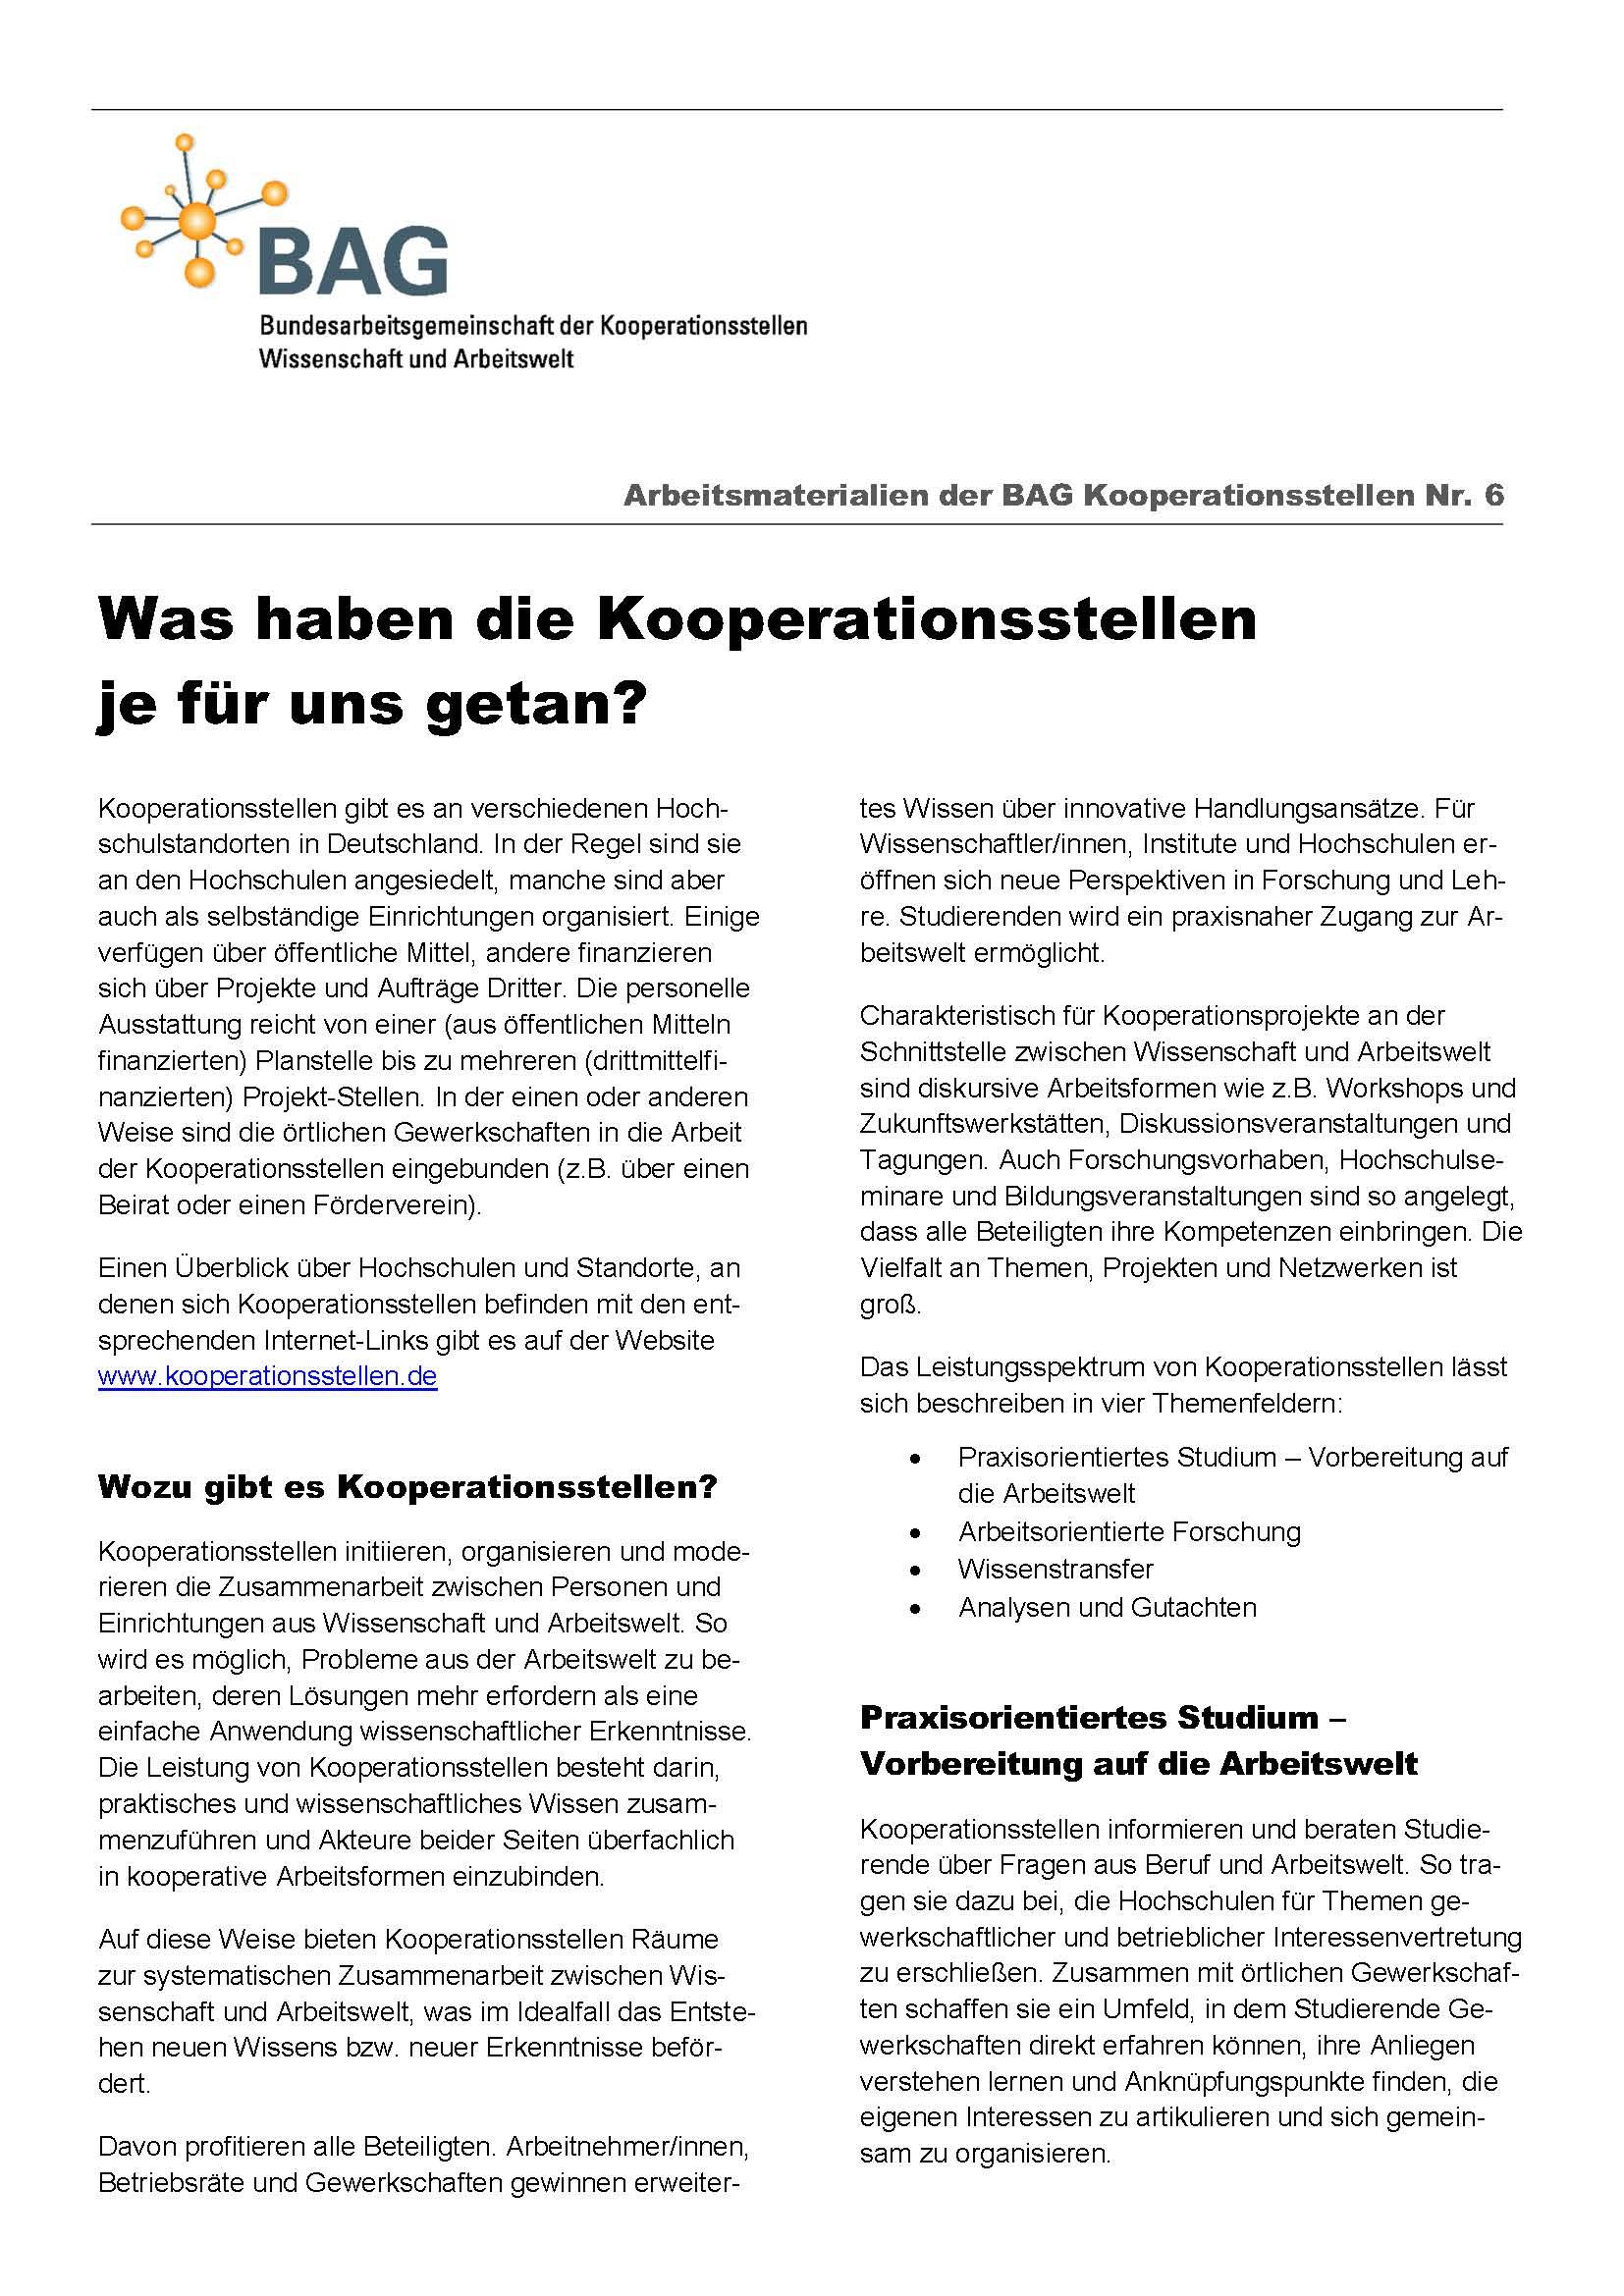 Arbeitsmaterialien der BAG Kooperationsstellen Nr. 6